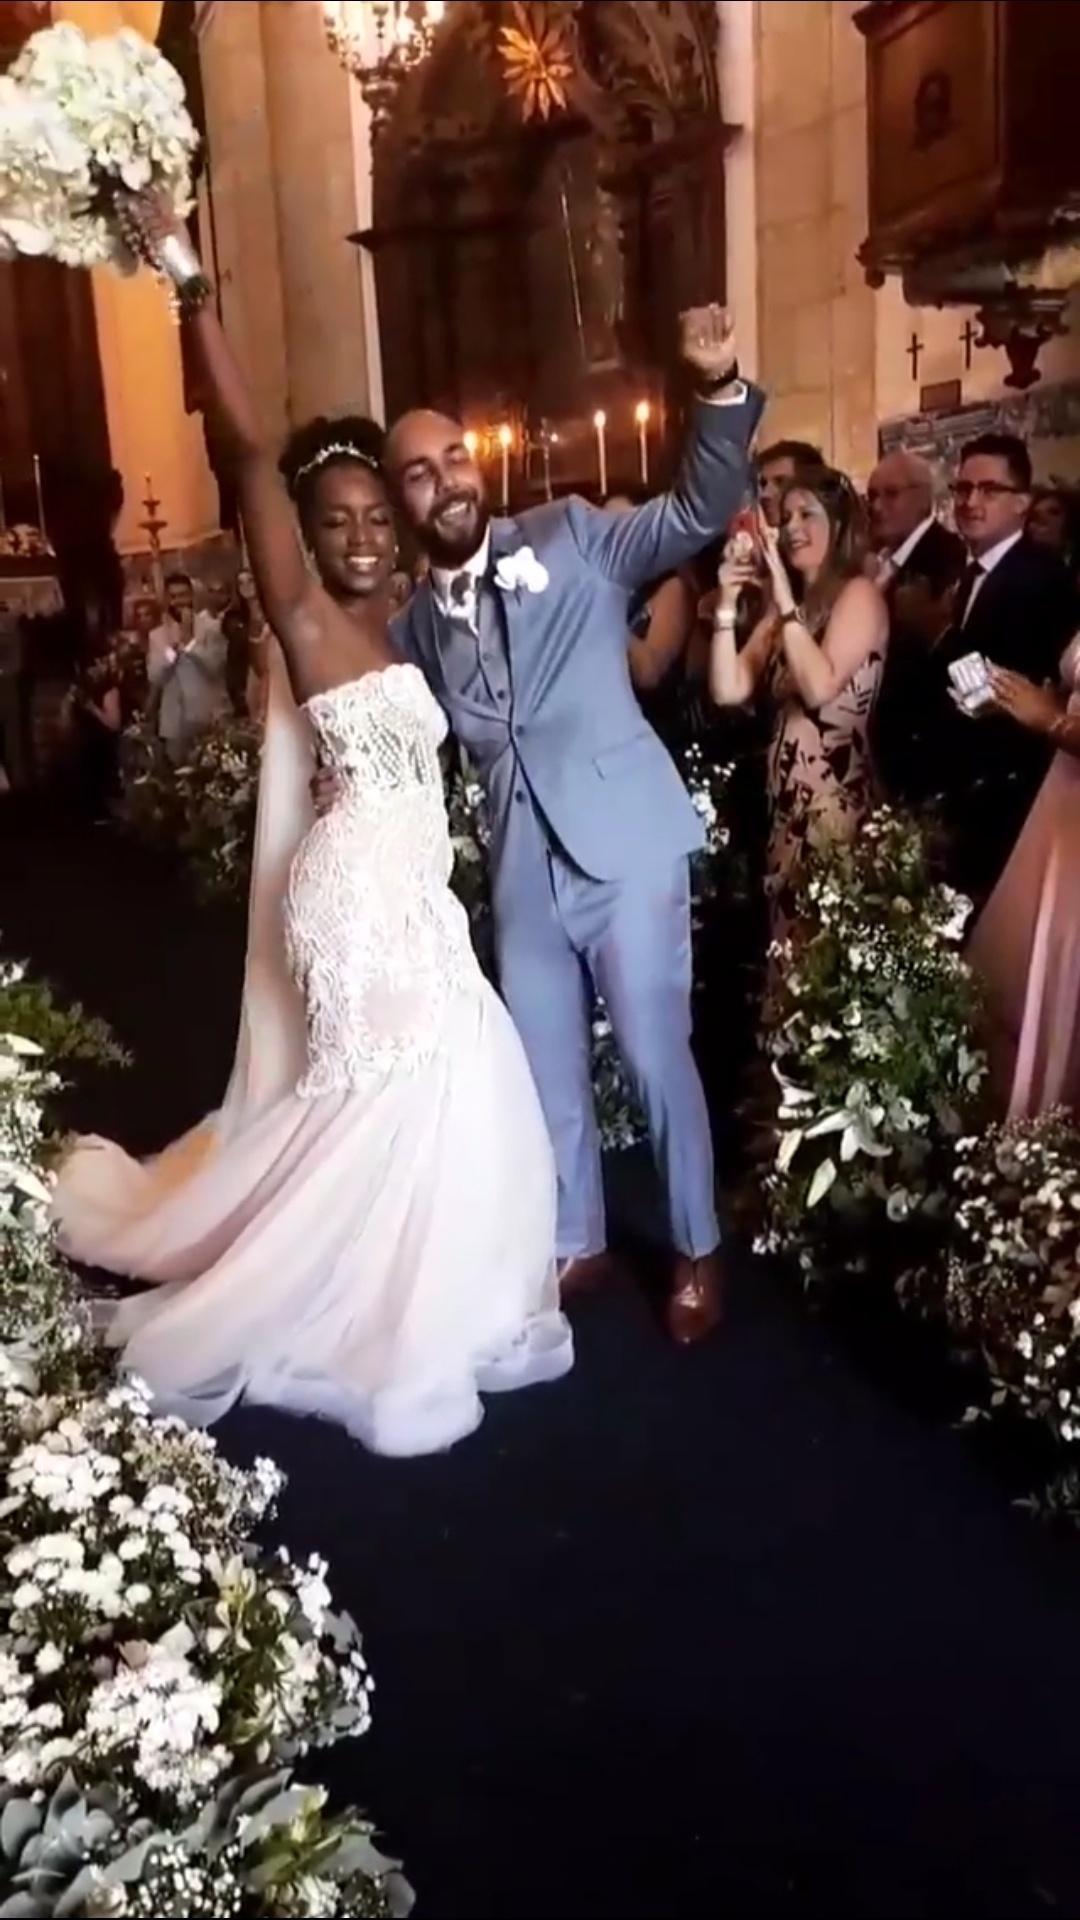 fb34123c0fc Transparência foi hit entre as noivas famosas de 2018  relembre os vestidos